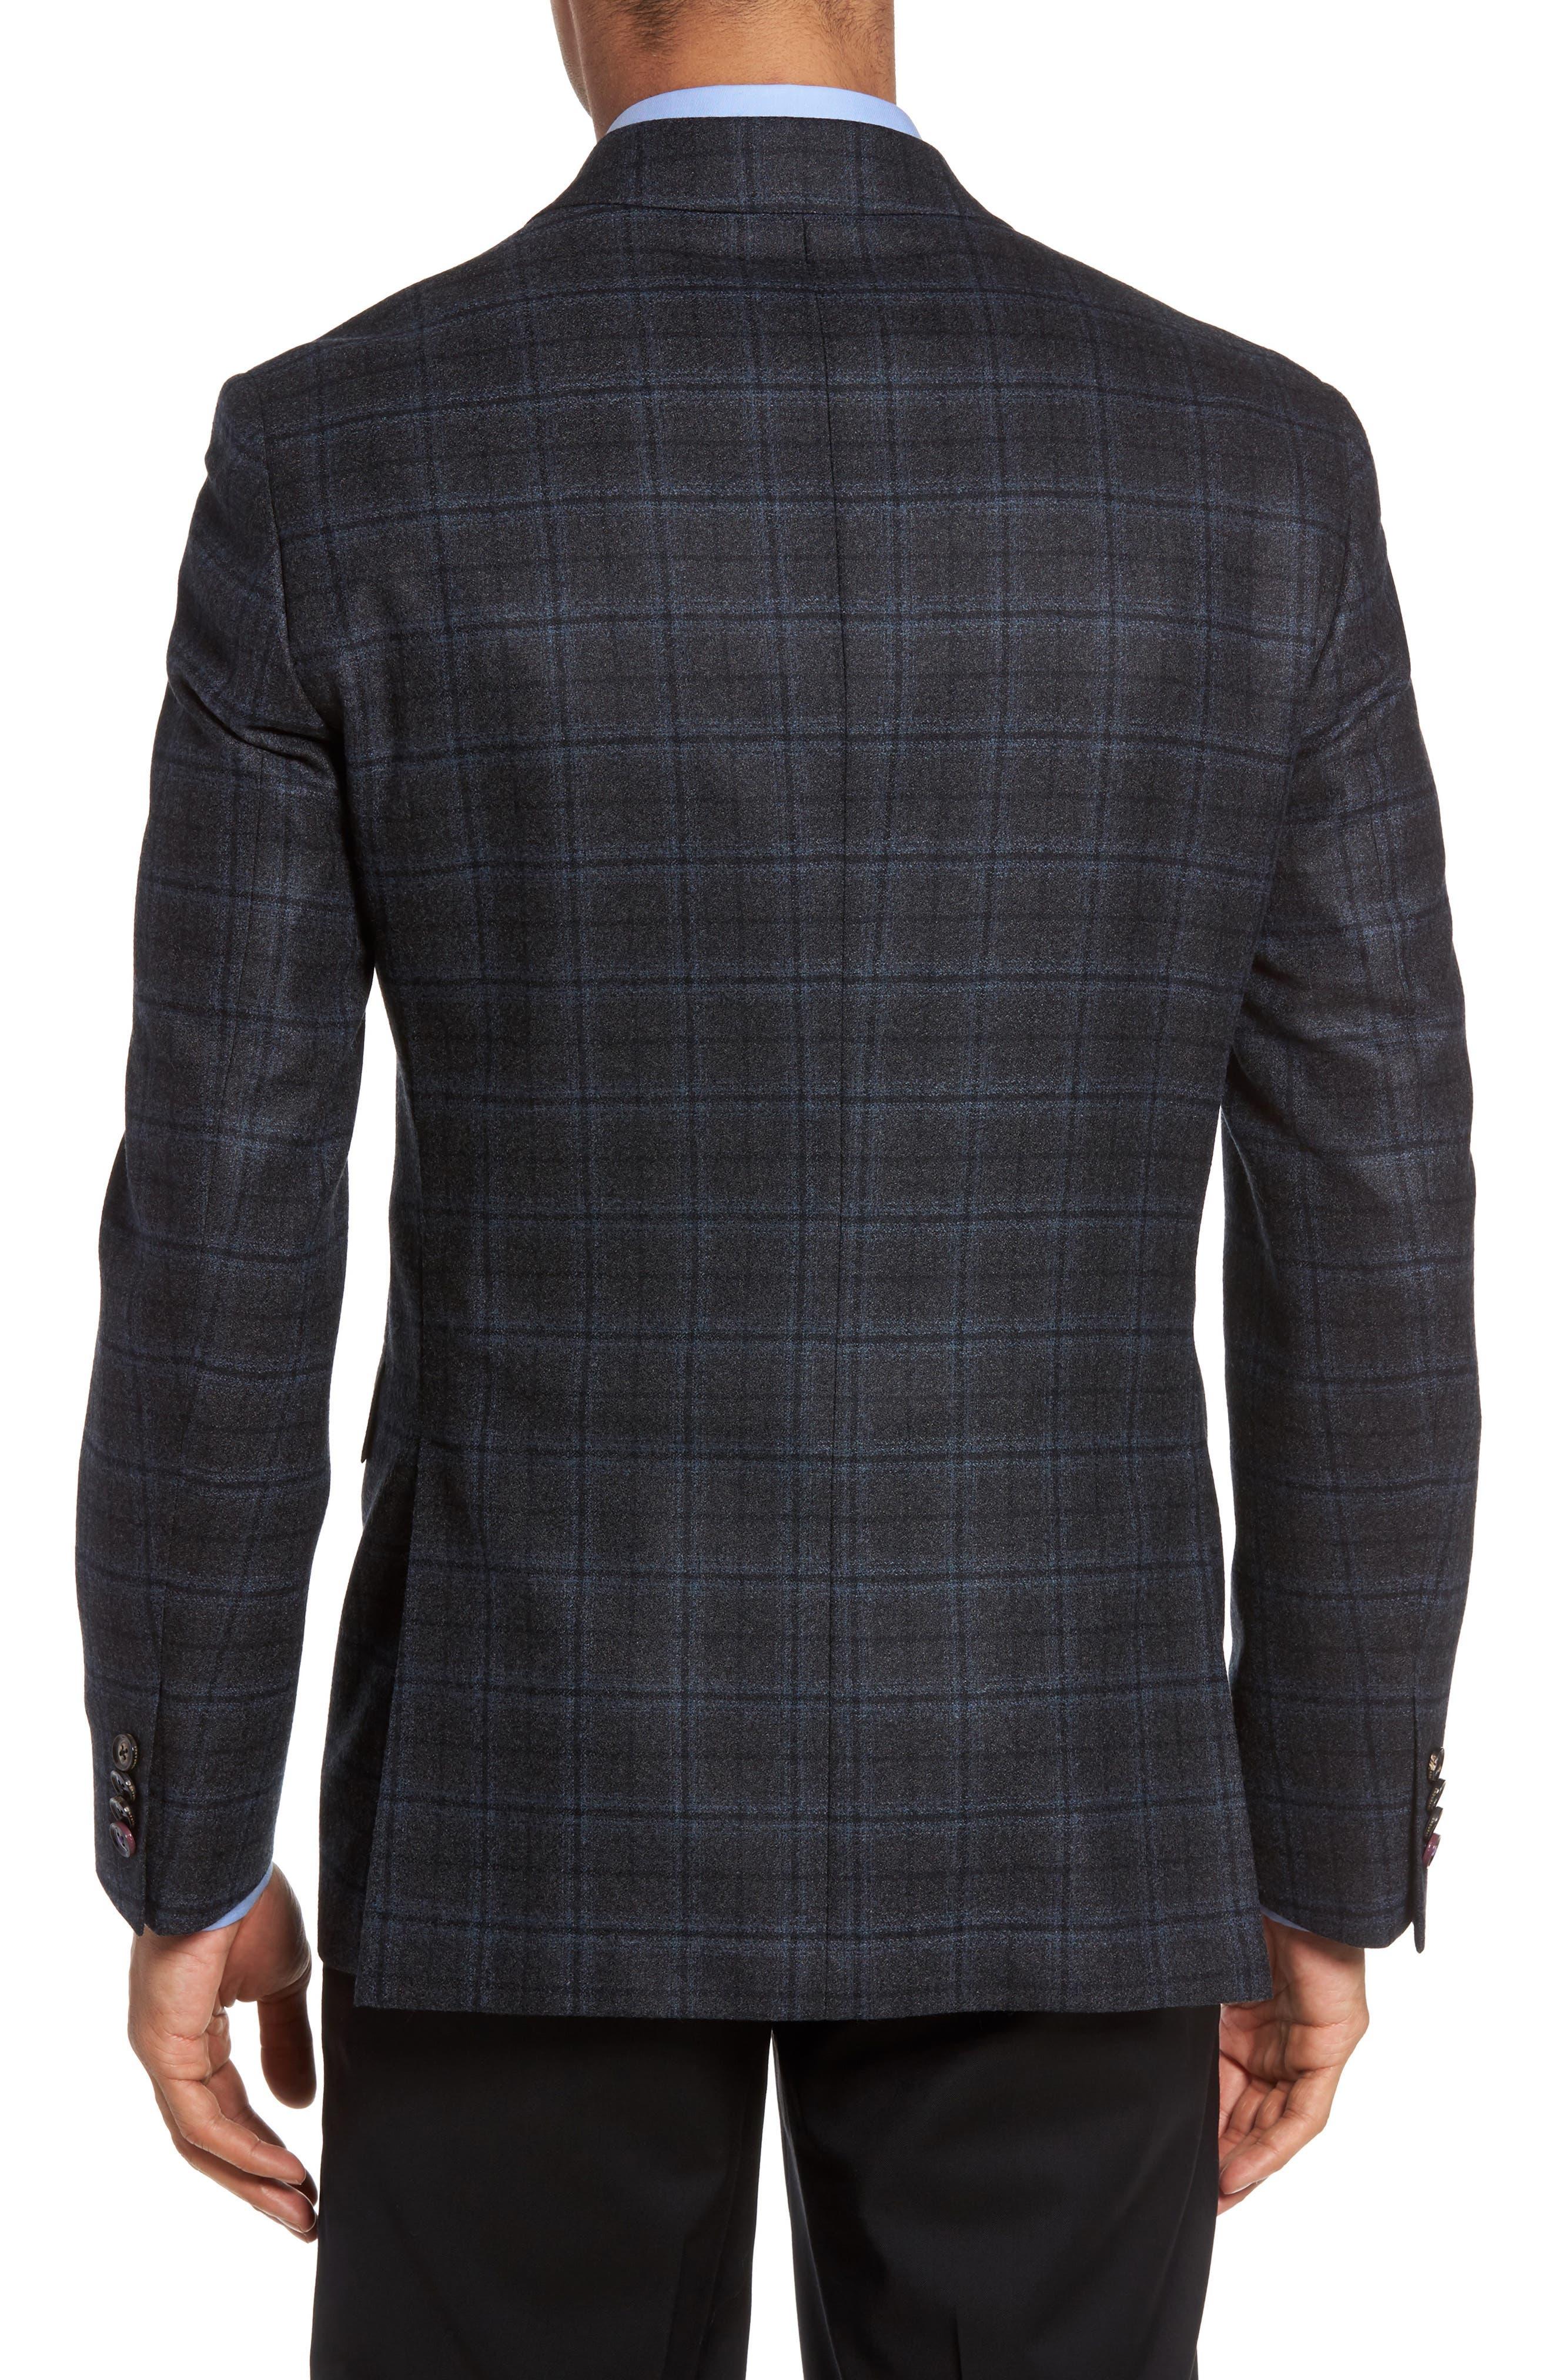 Konan Trim Fit Plaid Wool Sport Coat,                             Alternate thumbnail 2, color,                             020